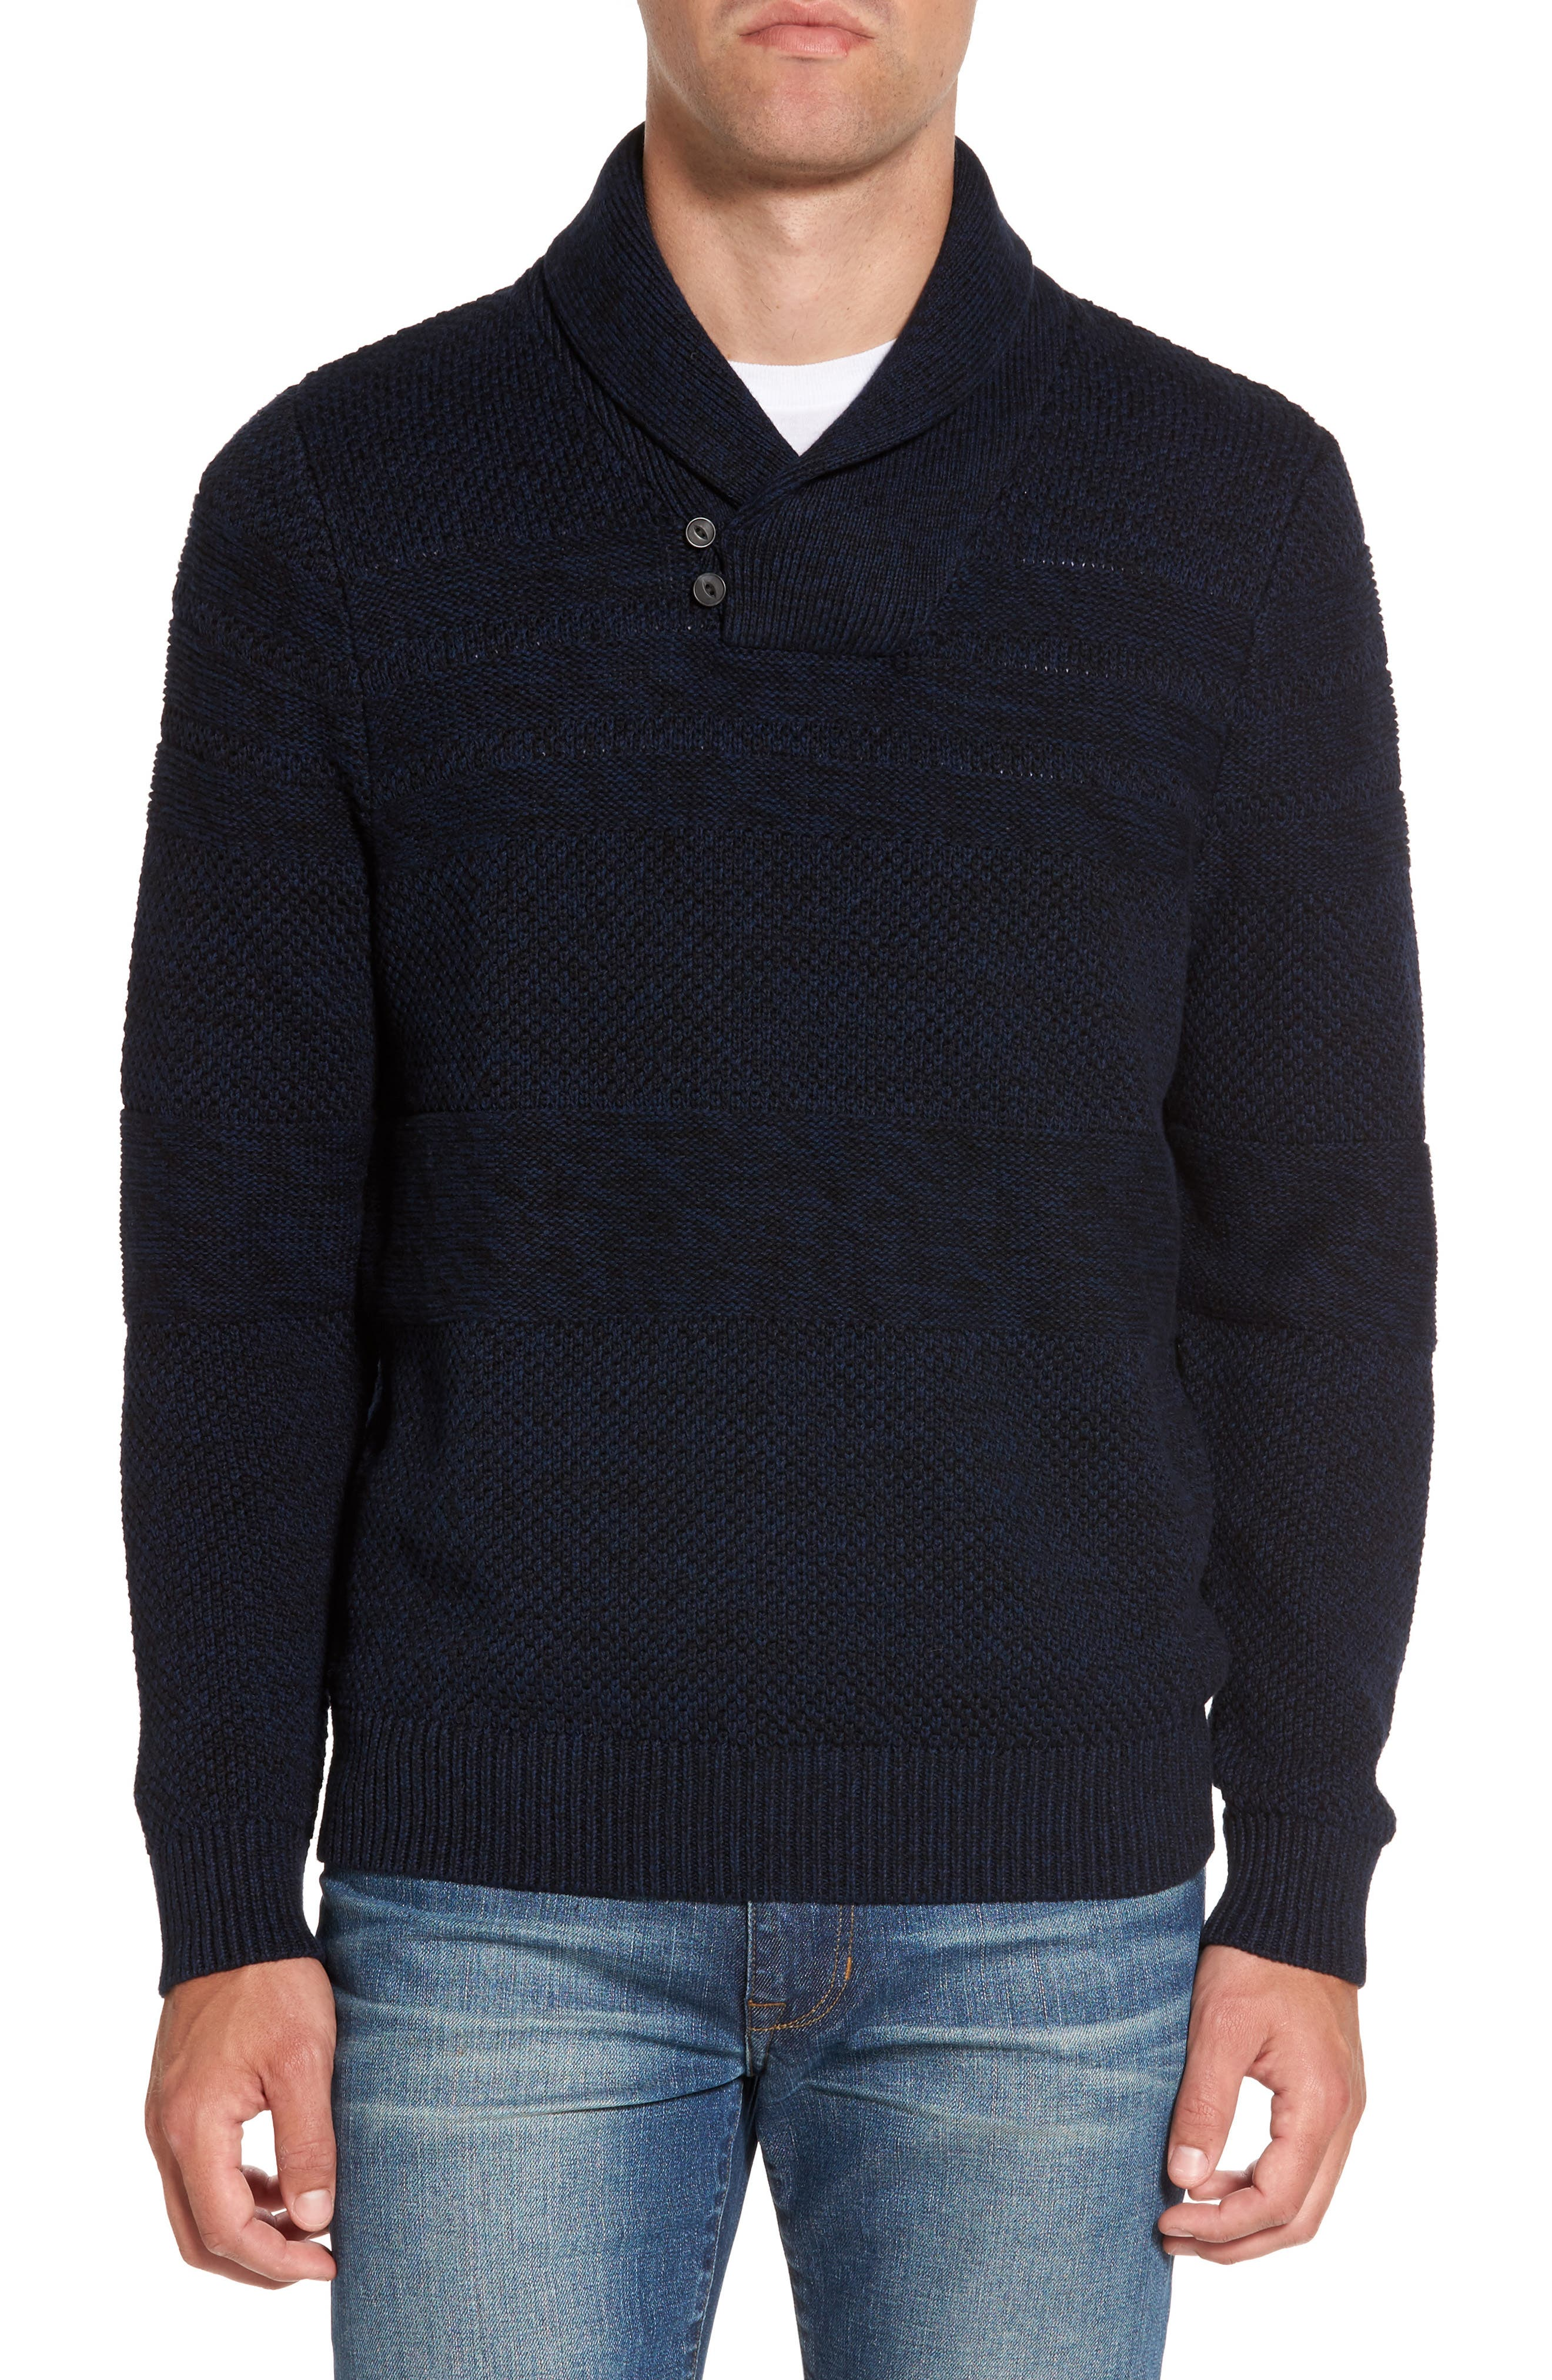 Nordstrom Men's Shop Shawl Collar Fisherman's Sweater